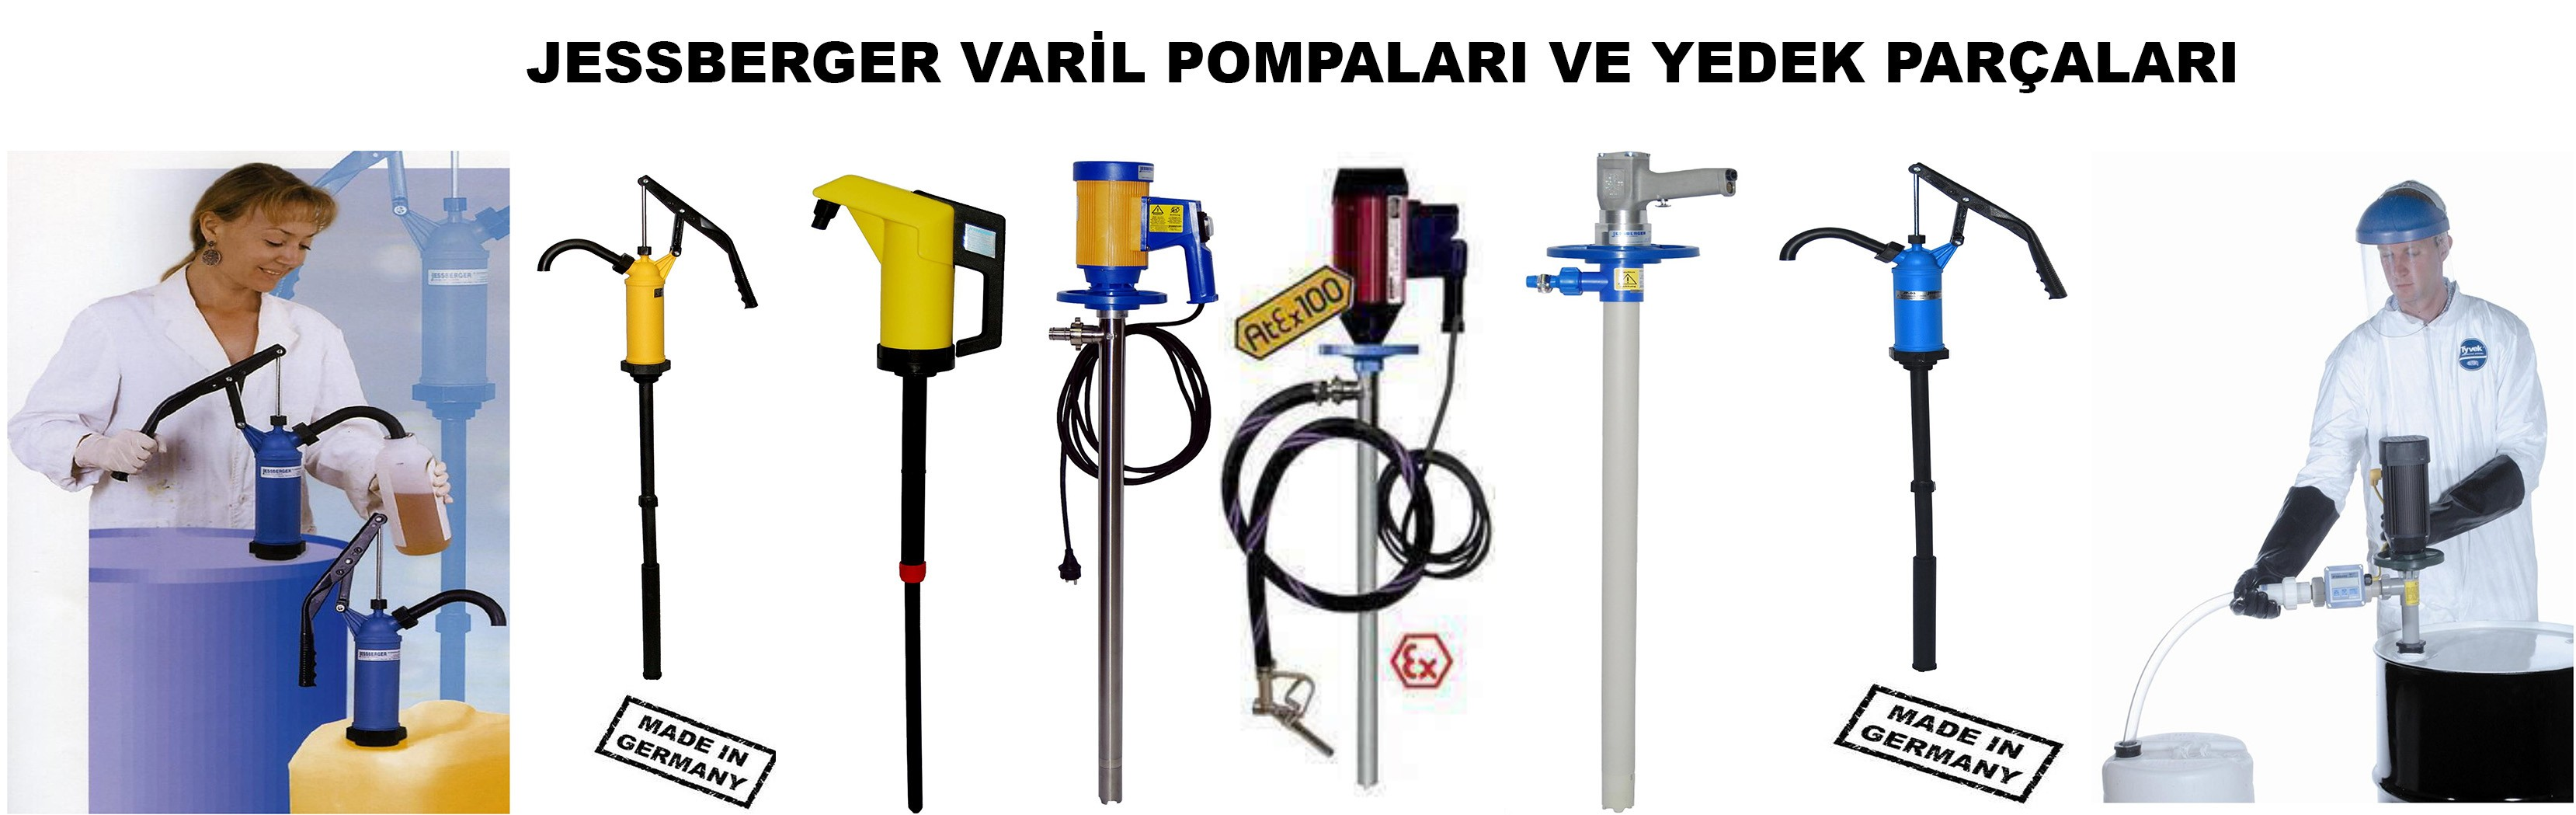 Jessberger Varil Pompaları